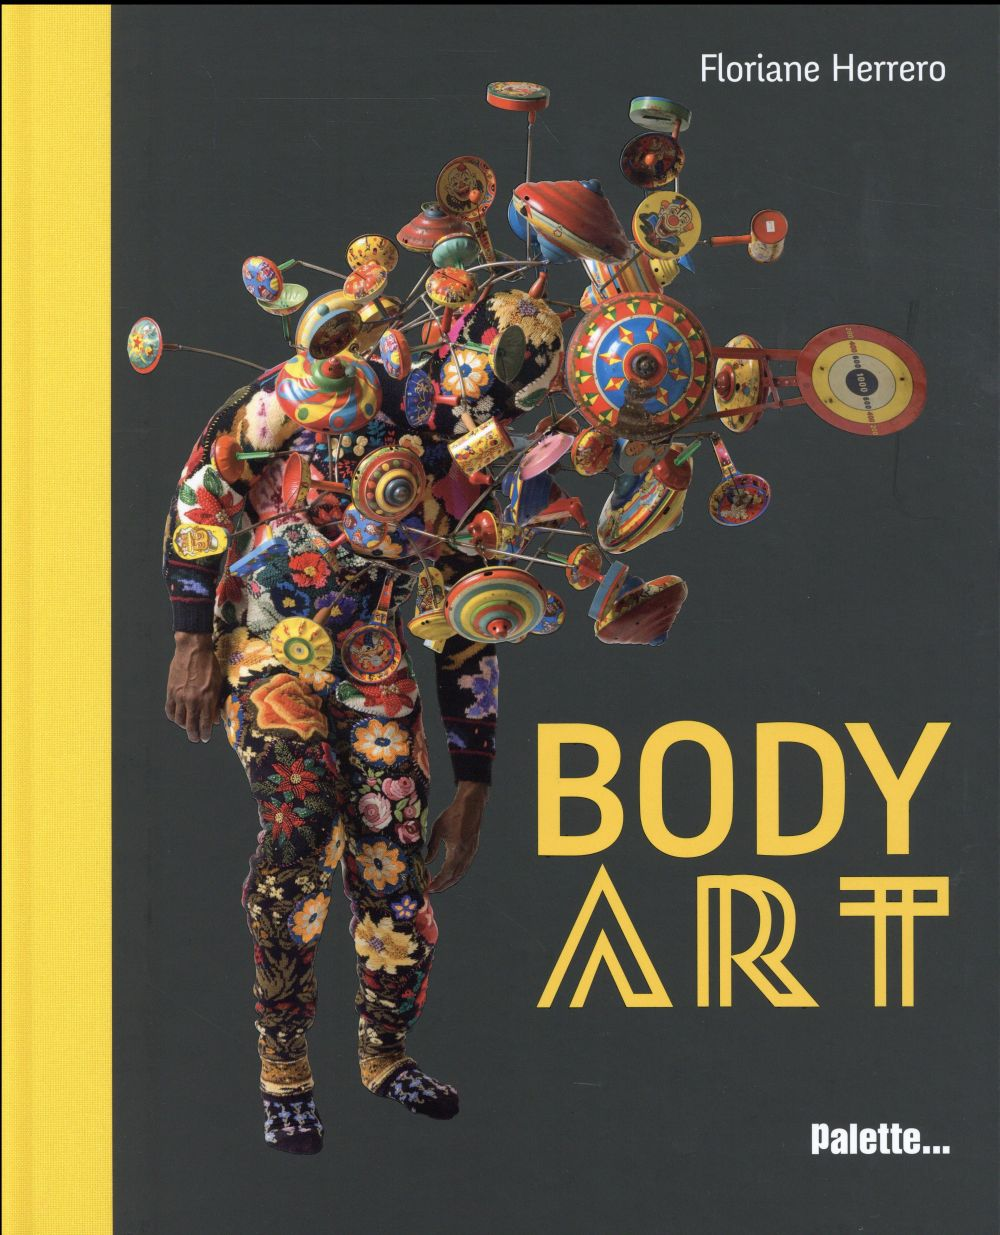 BODY ART.